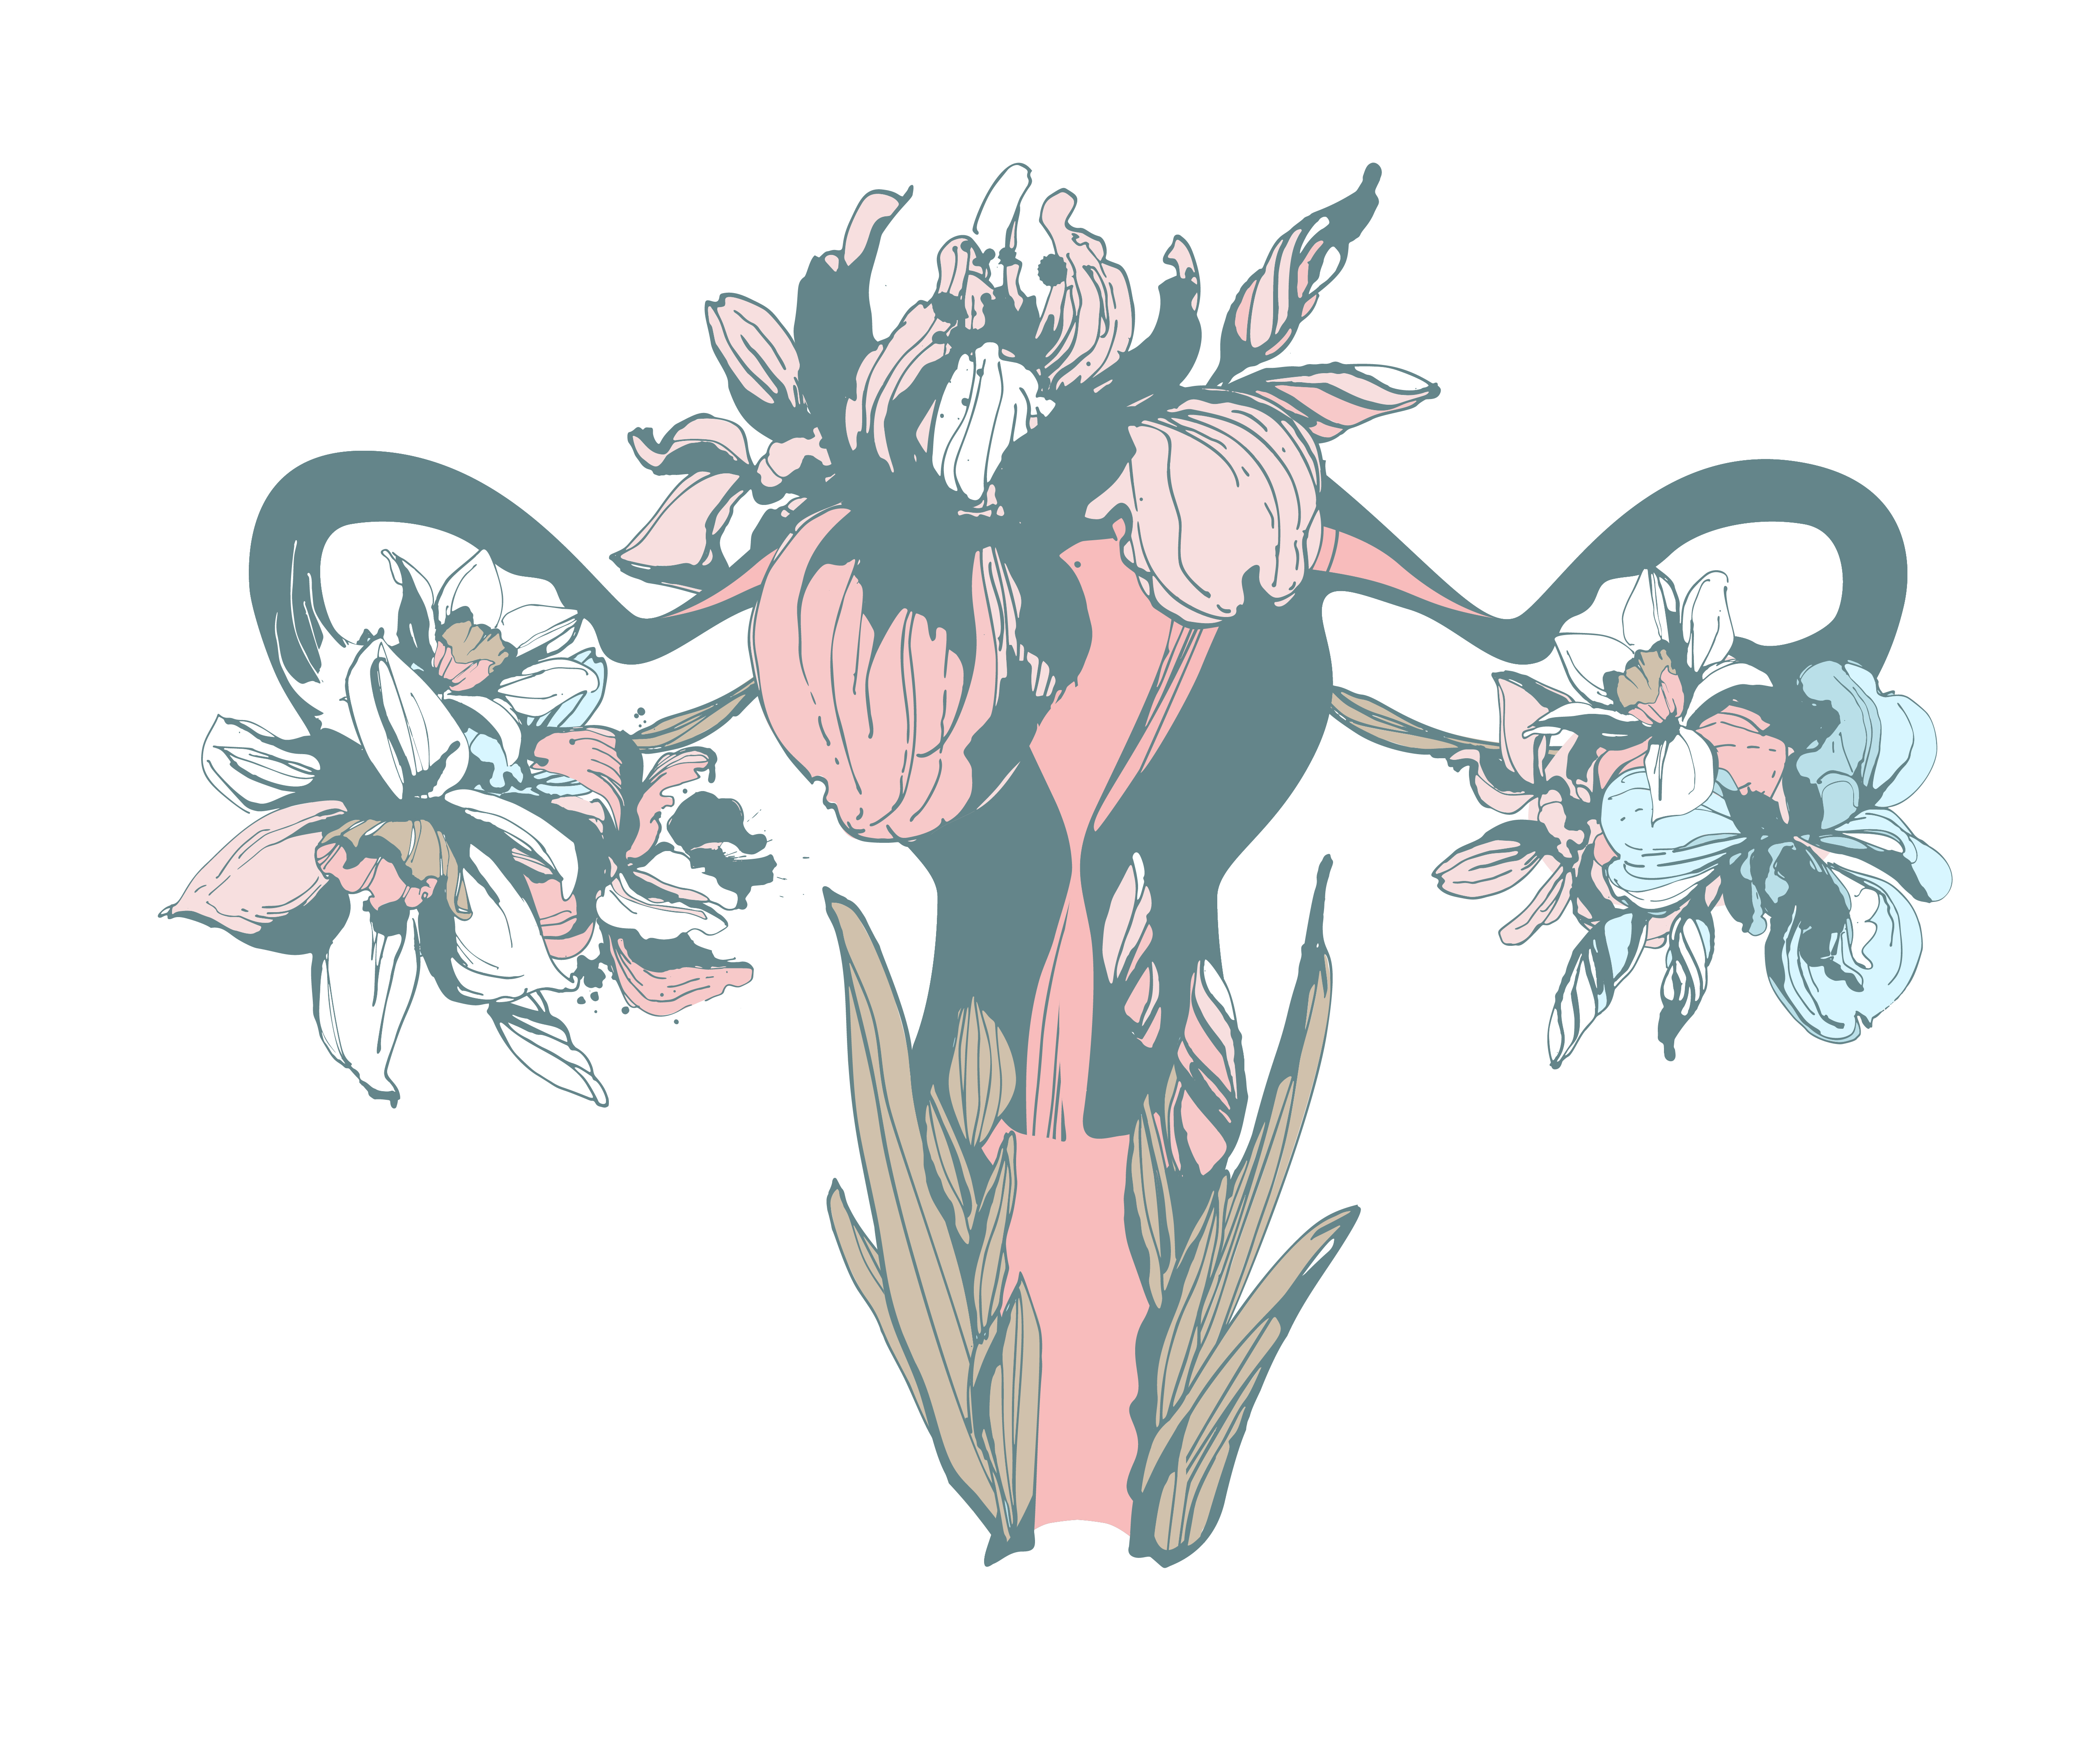 uterus-change-aging